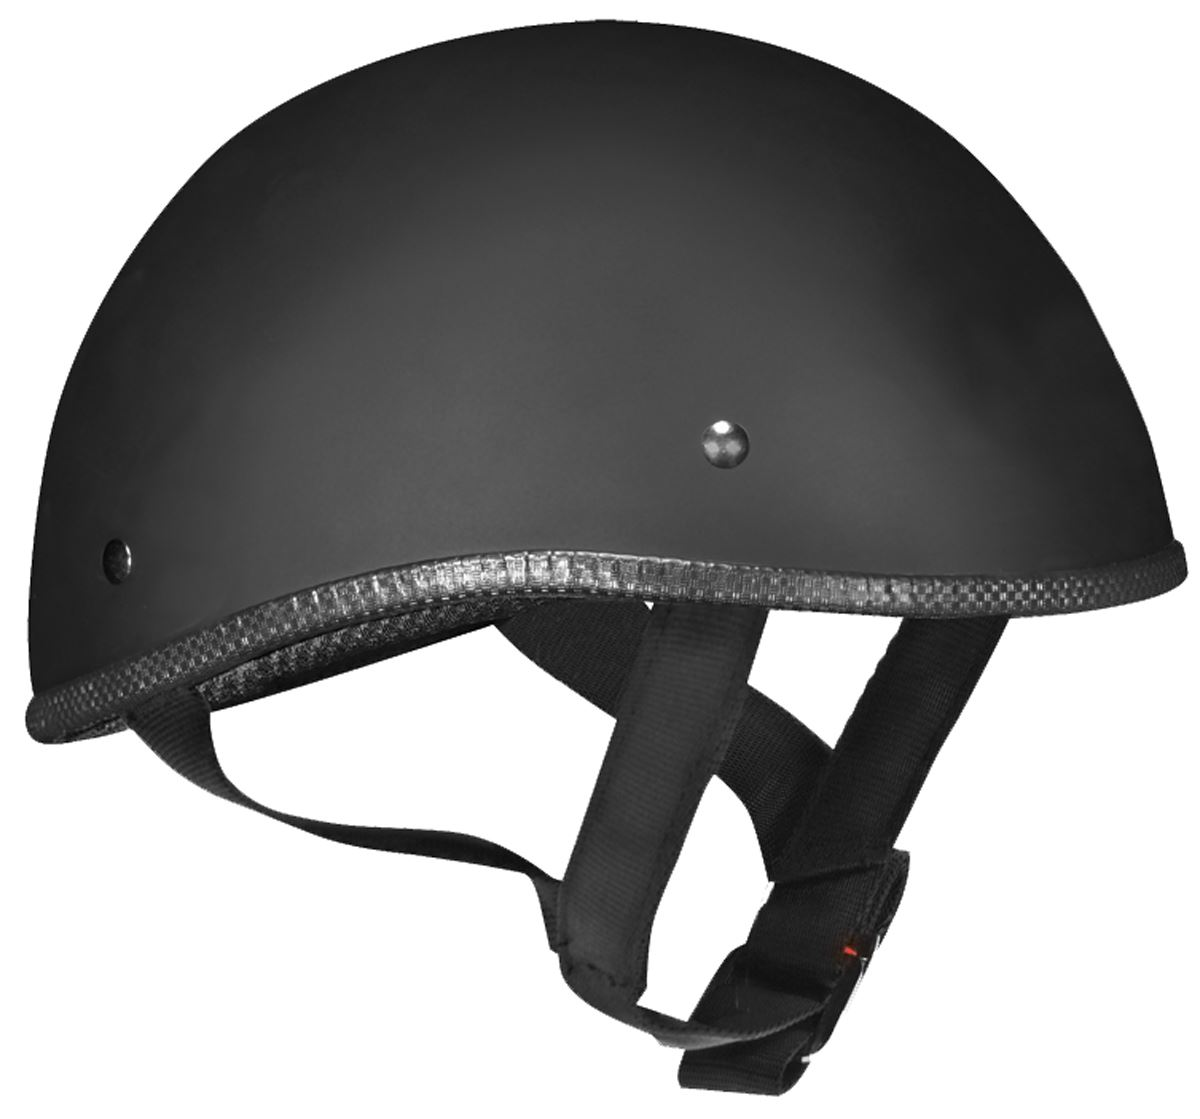 Vega XTS Naked Half Helmet Gloss Black Medium - Laura